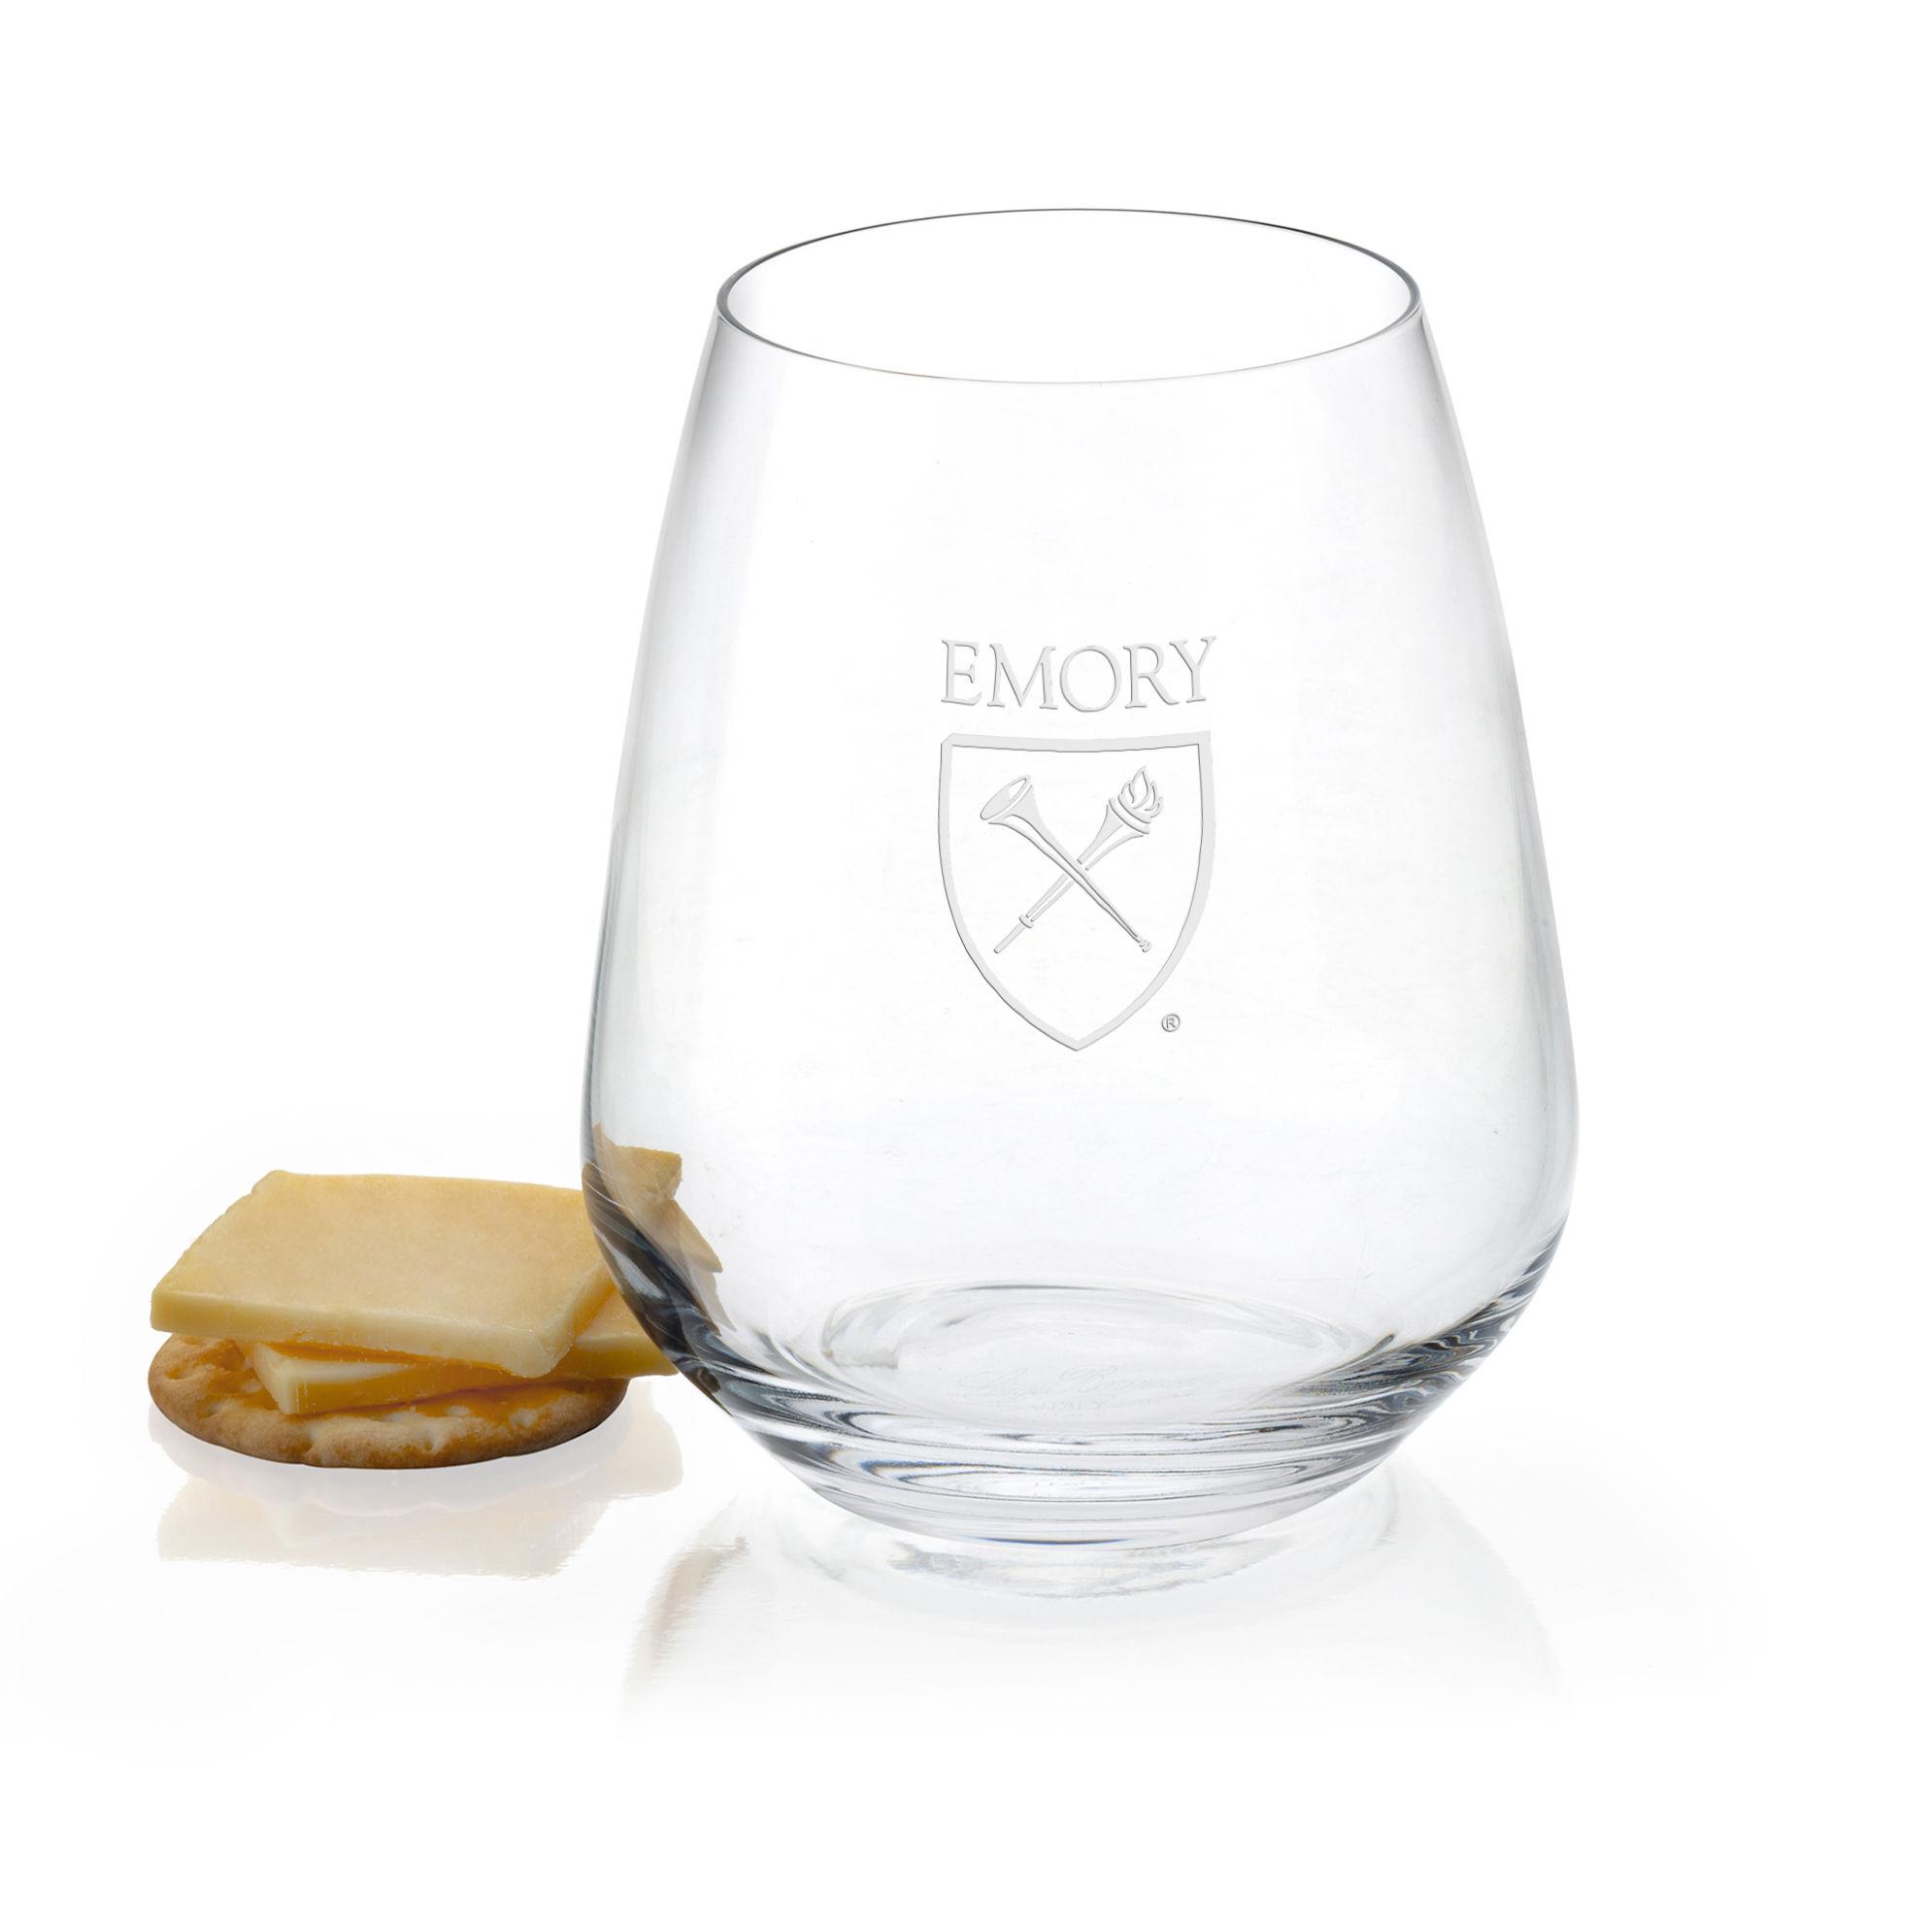 Emory Stemless Wine Glasses - Set of 4